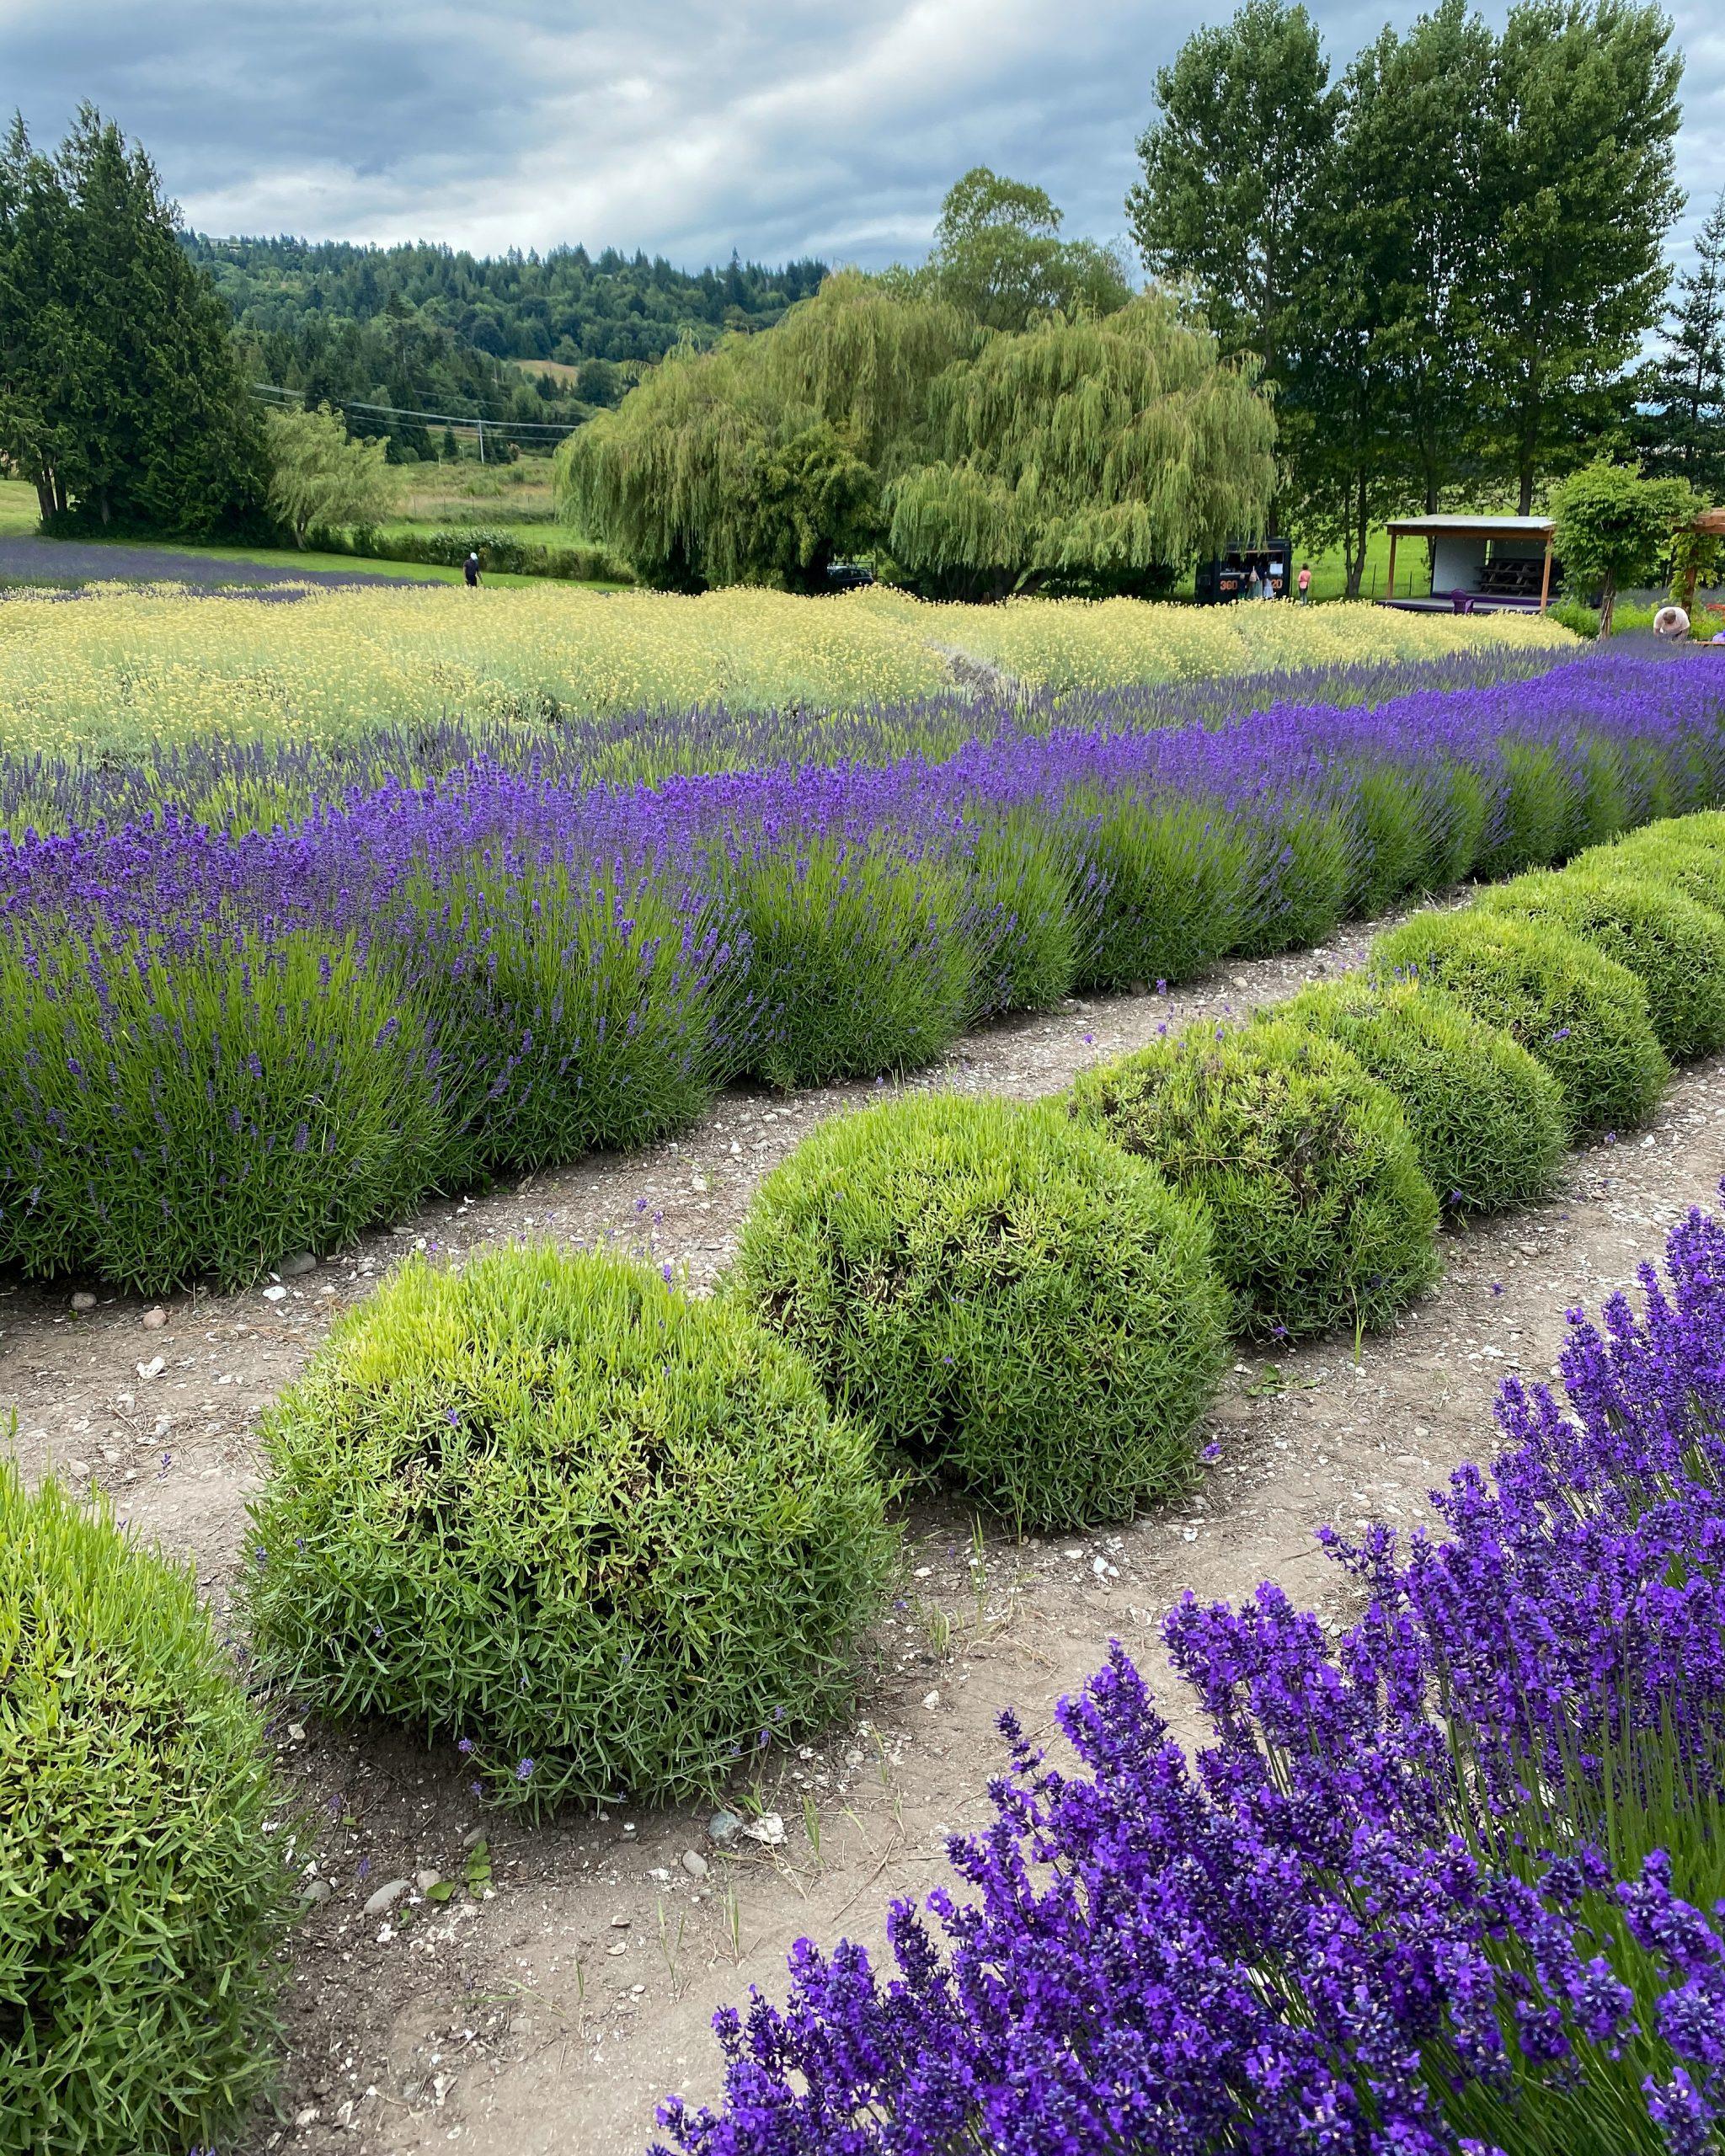 lavender farms Washington state